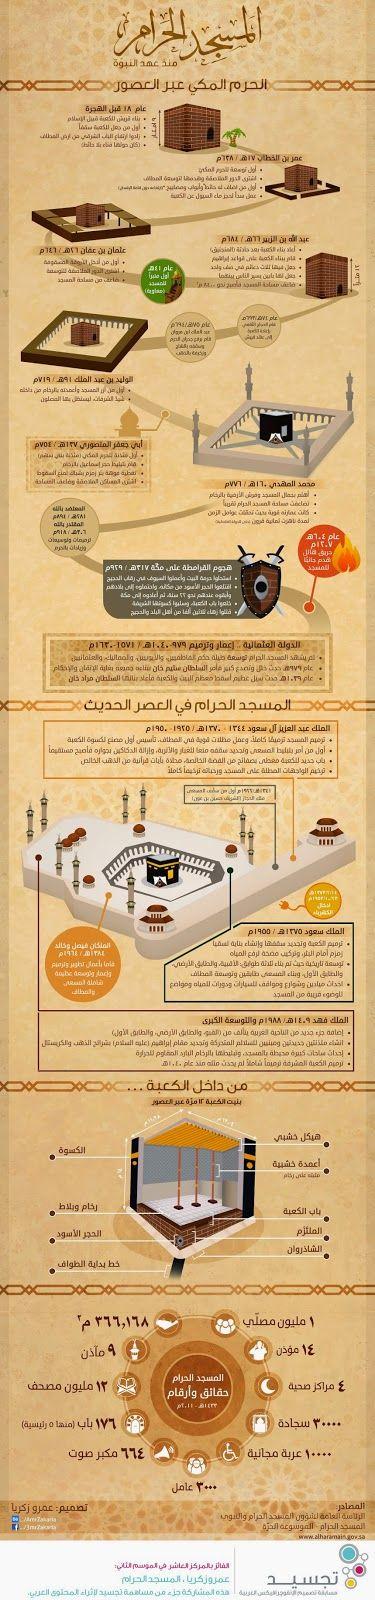 Mahalet Damana: المسجد الحرام منذ عهد النبوة انفوجرافك